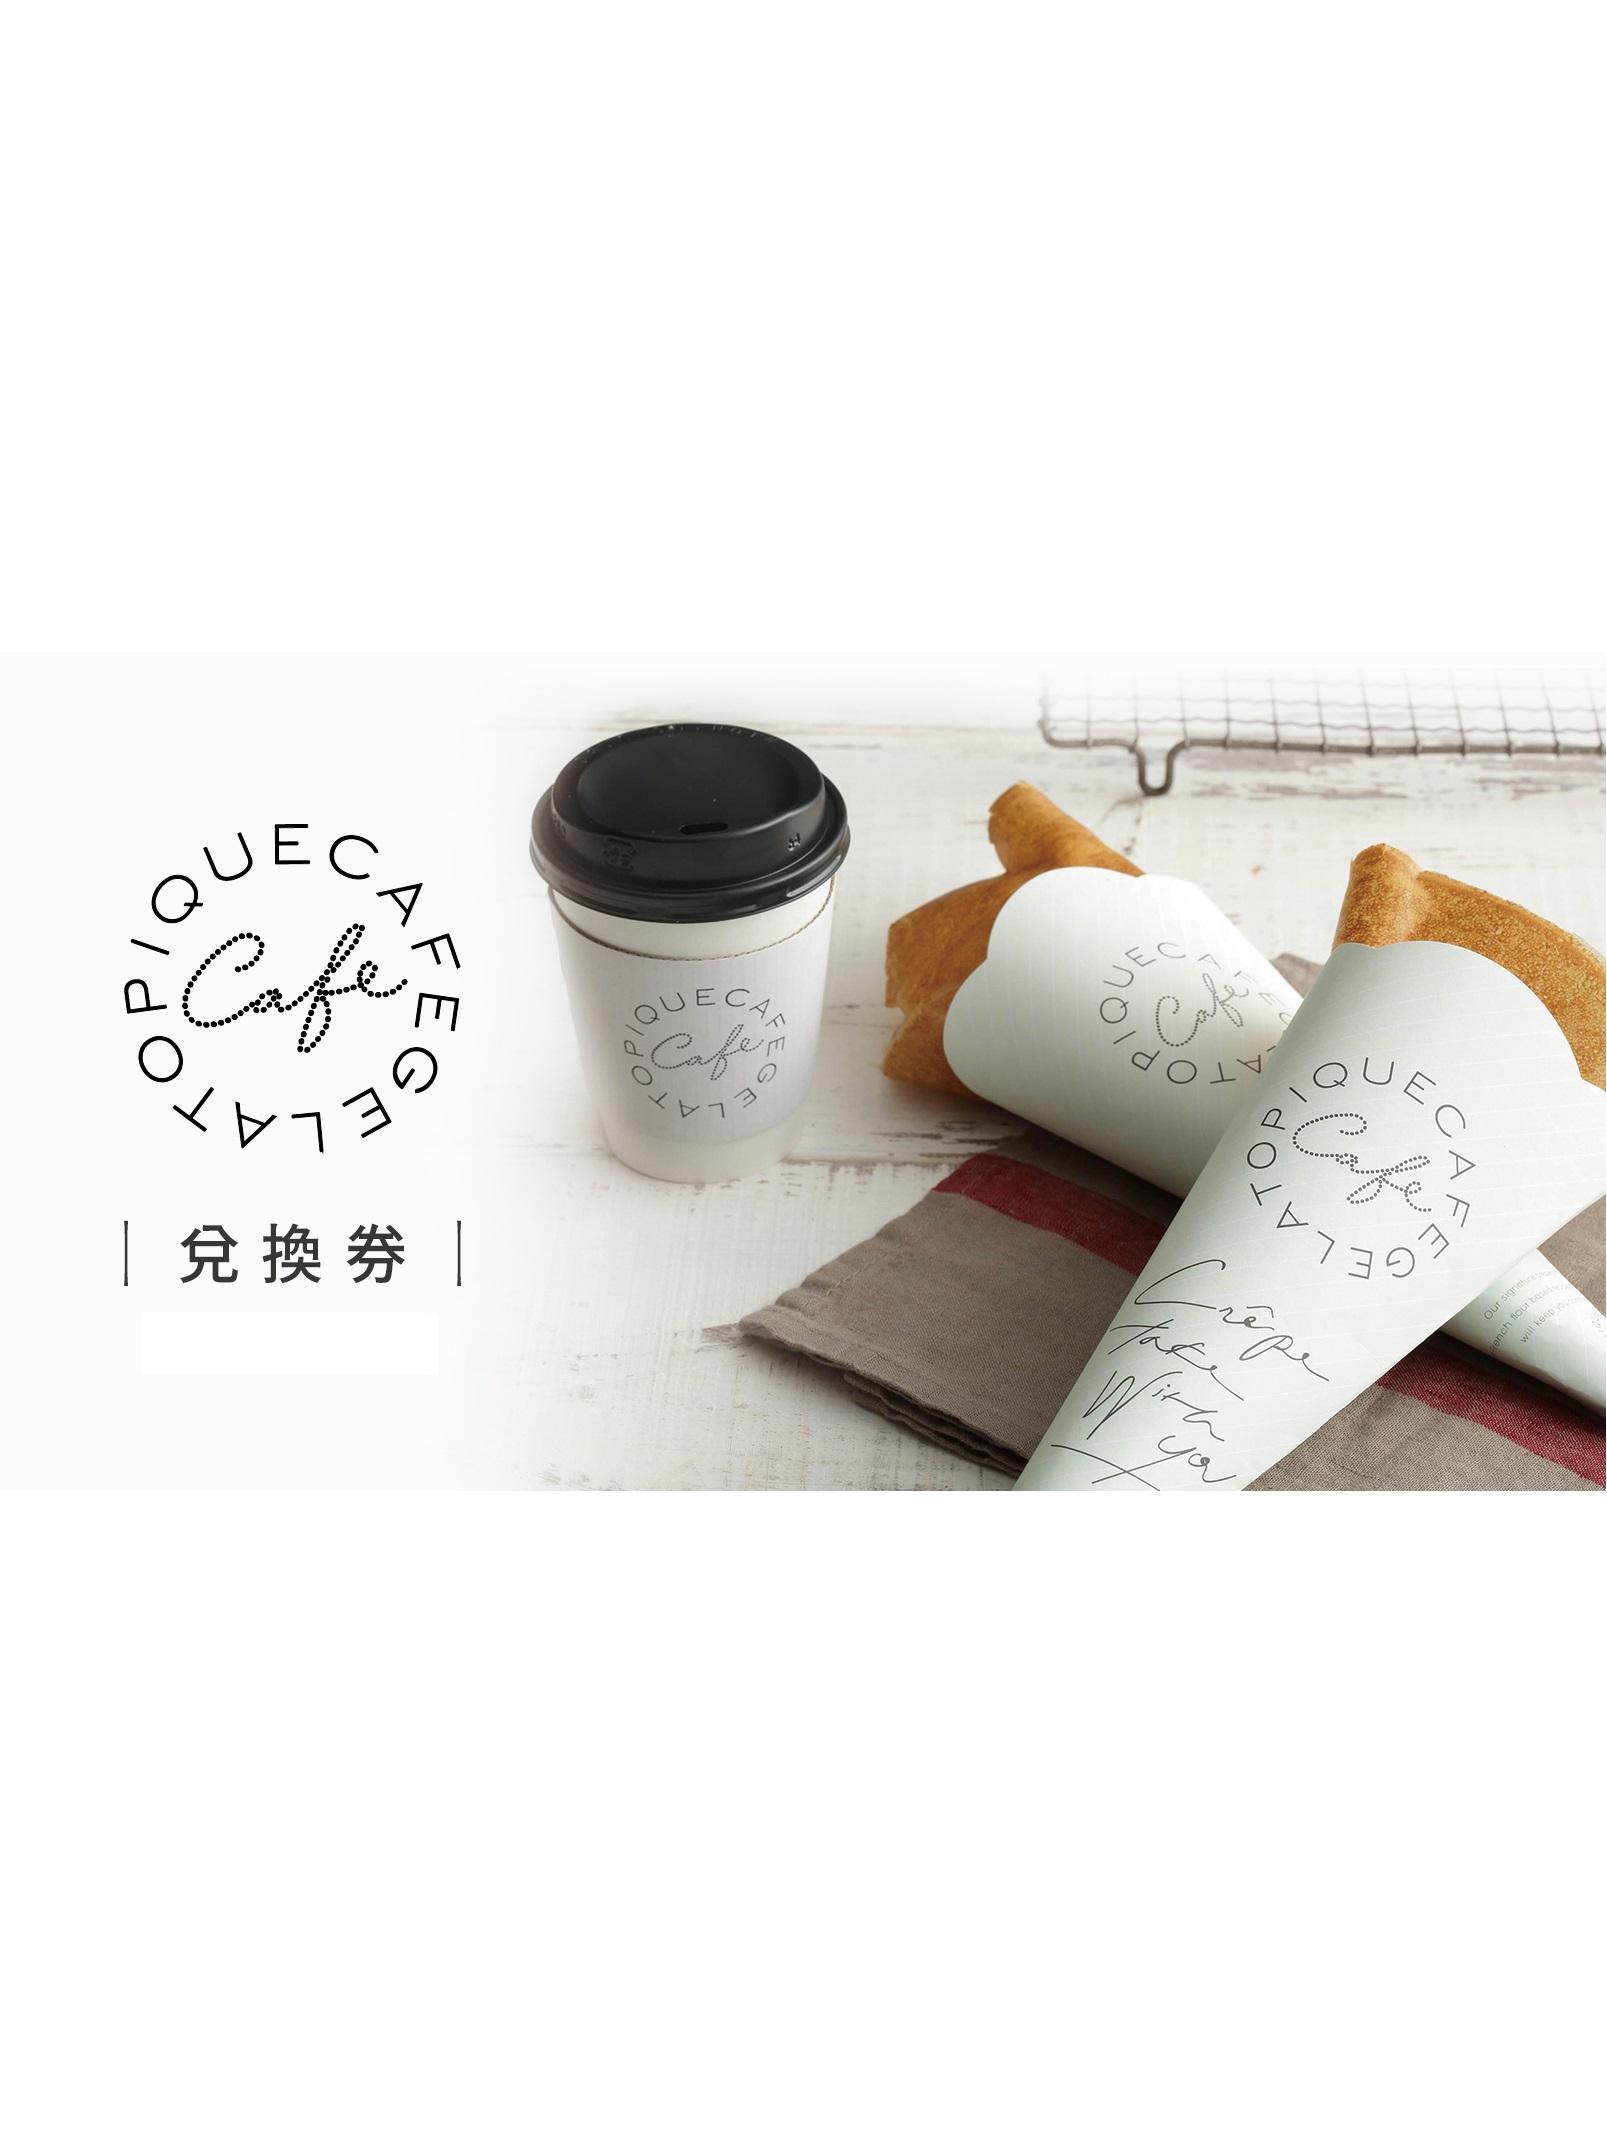 (預購)gelato pique cafe超值餐券